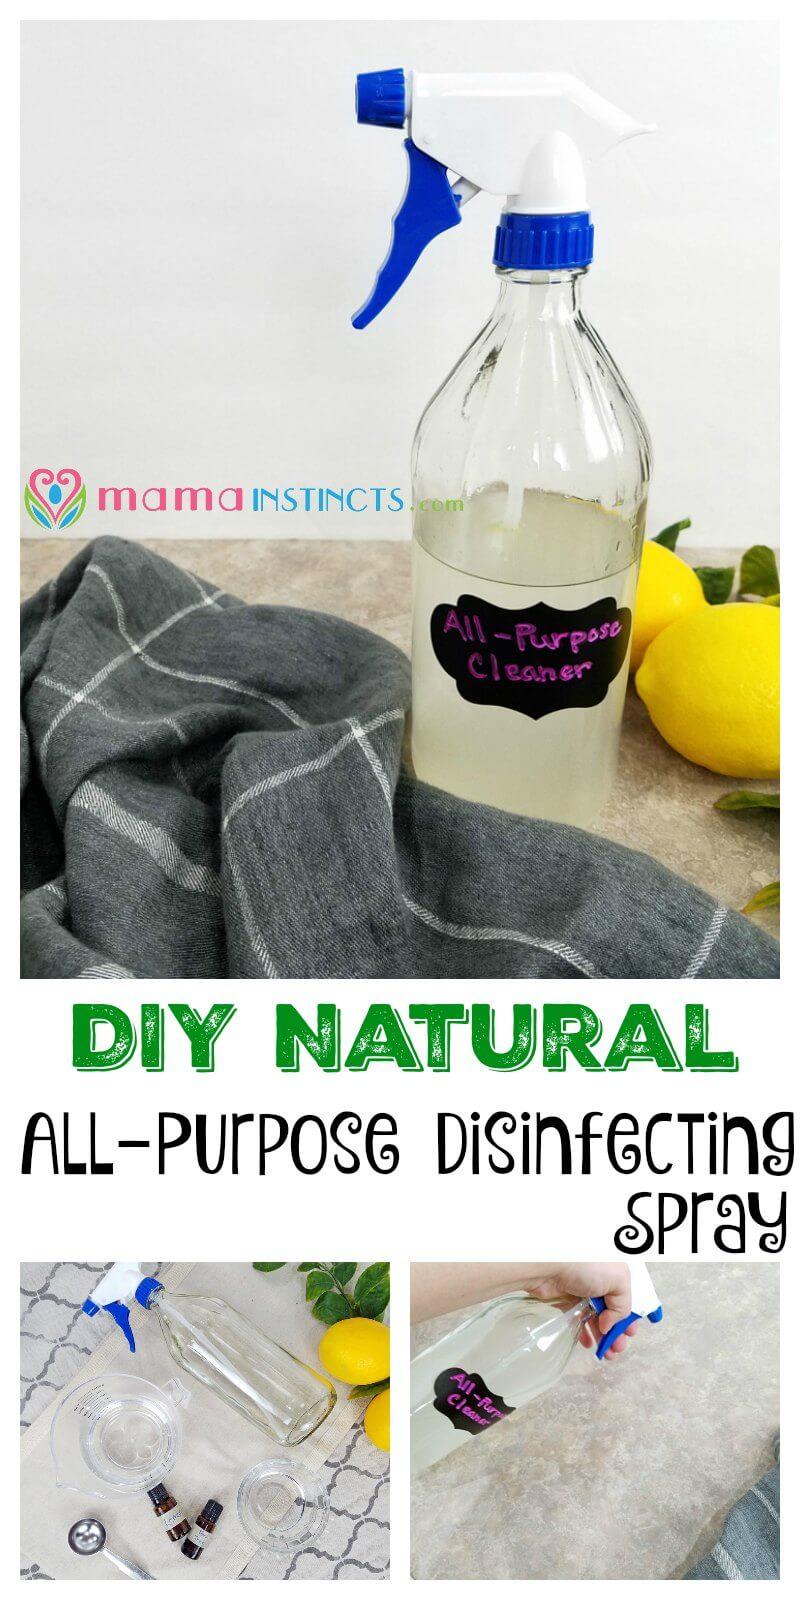 DIY Natural All-Purpose Disinfecting Spray – Mama Instincts®